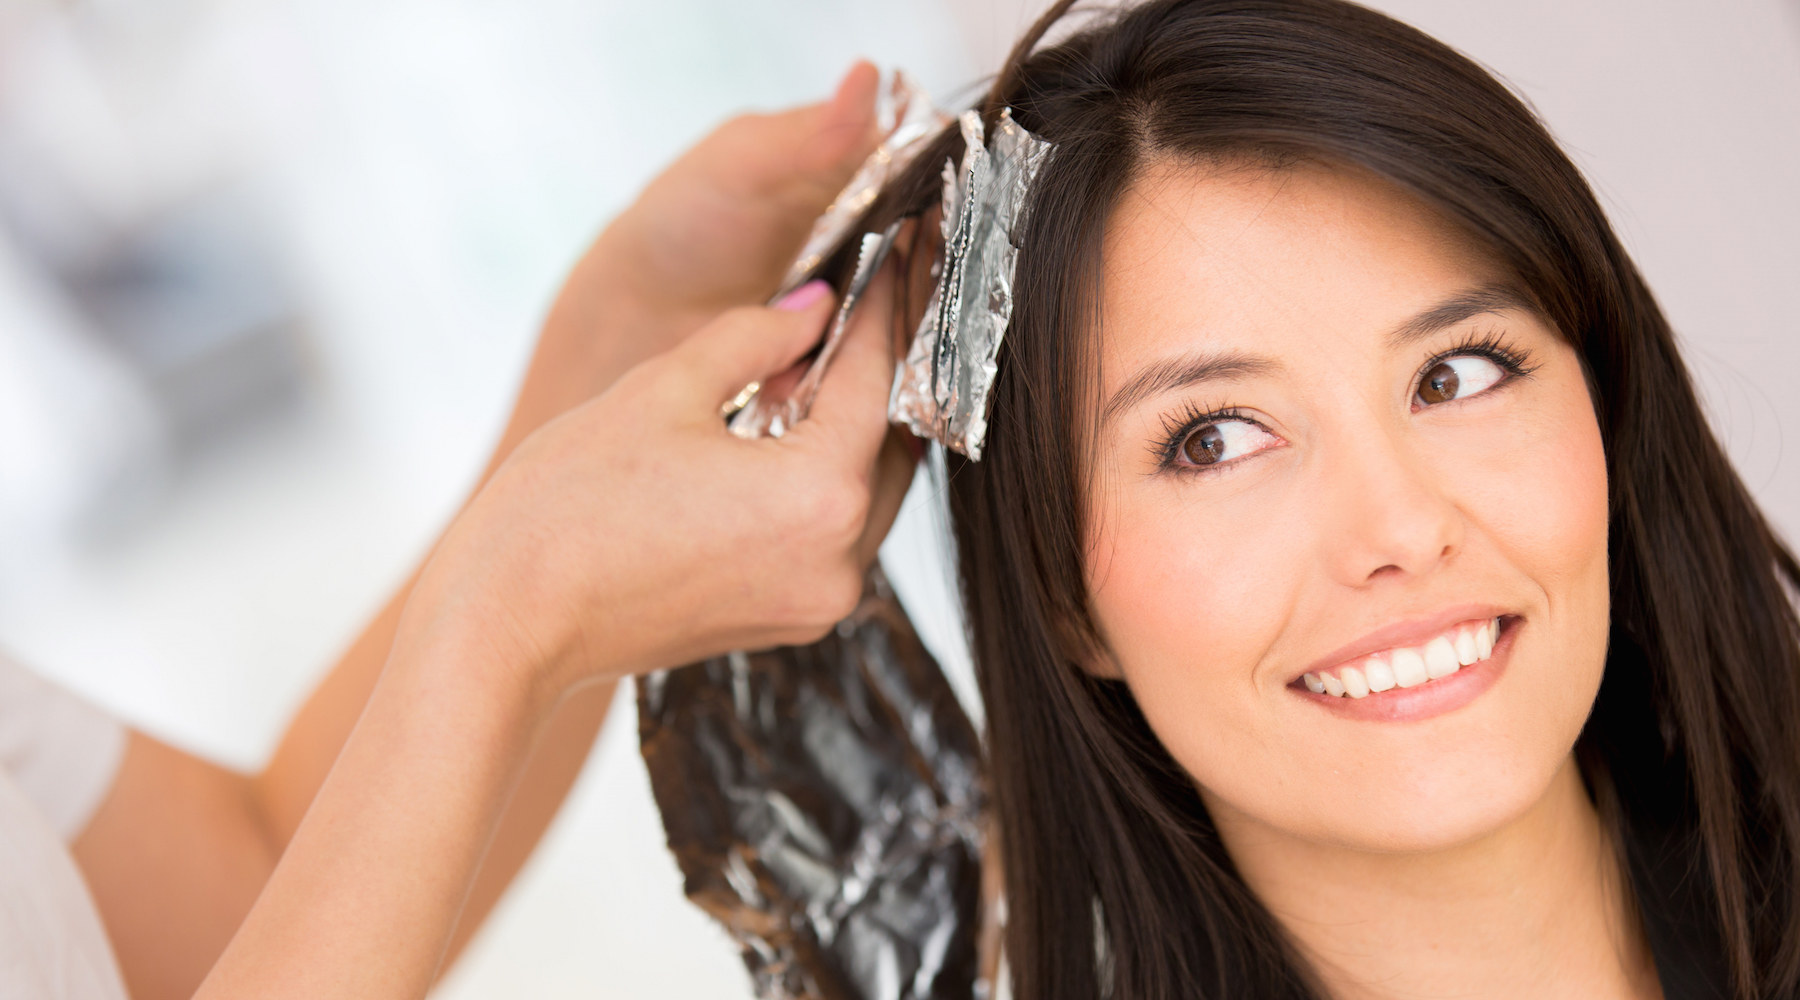 Woman dying hair beauty salon